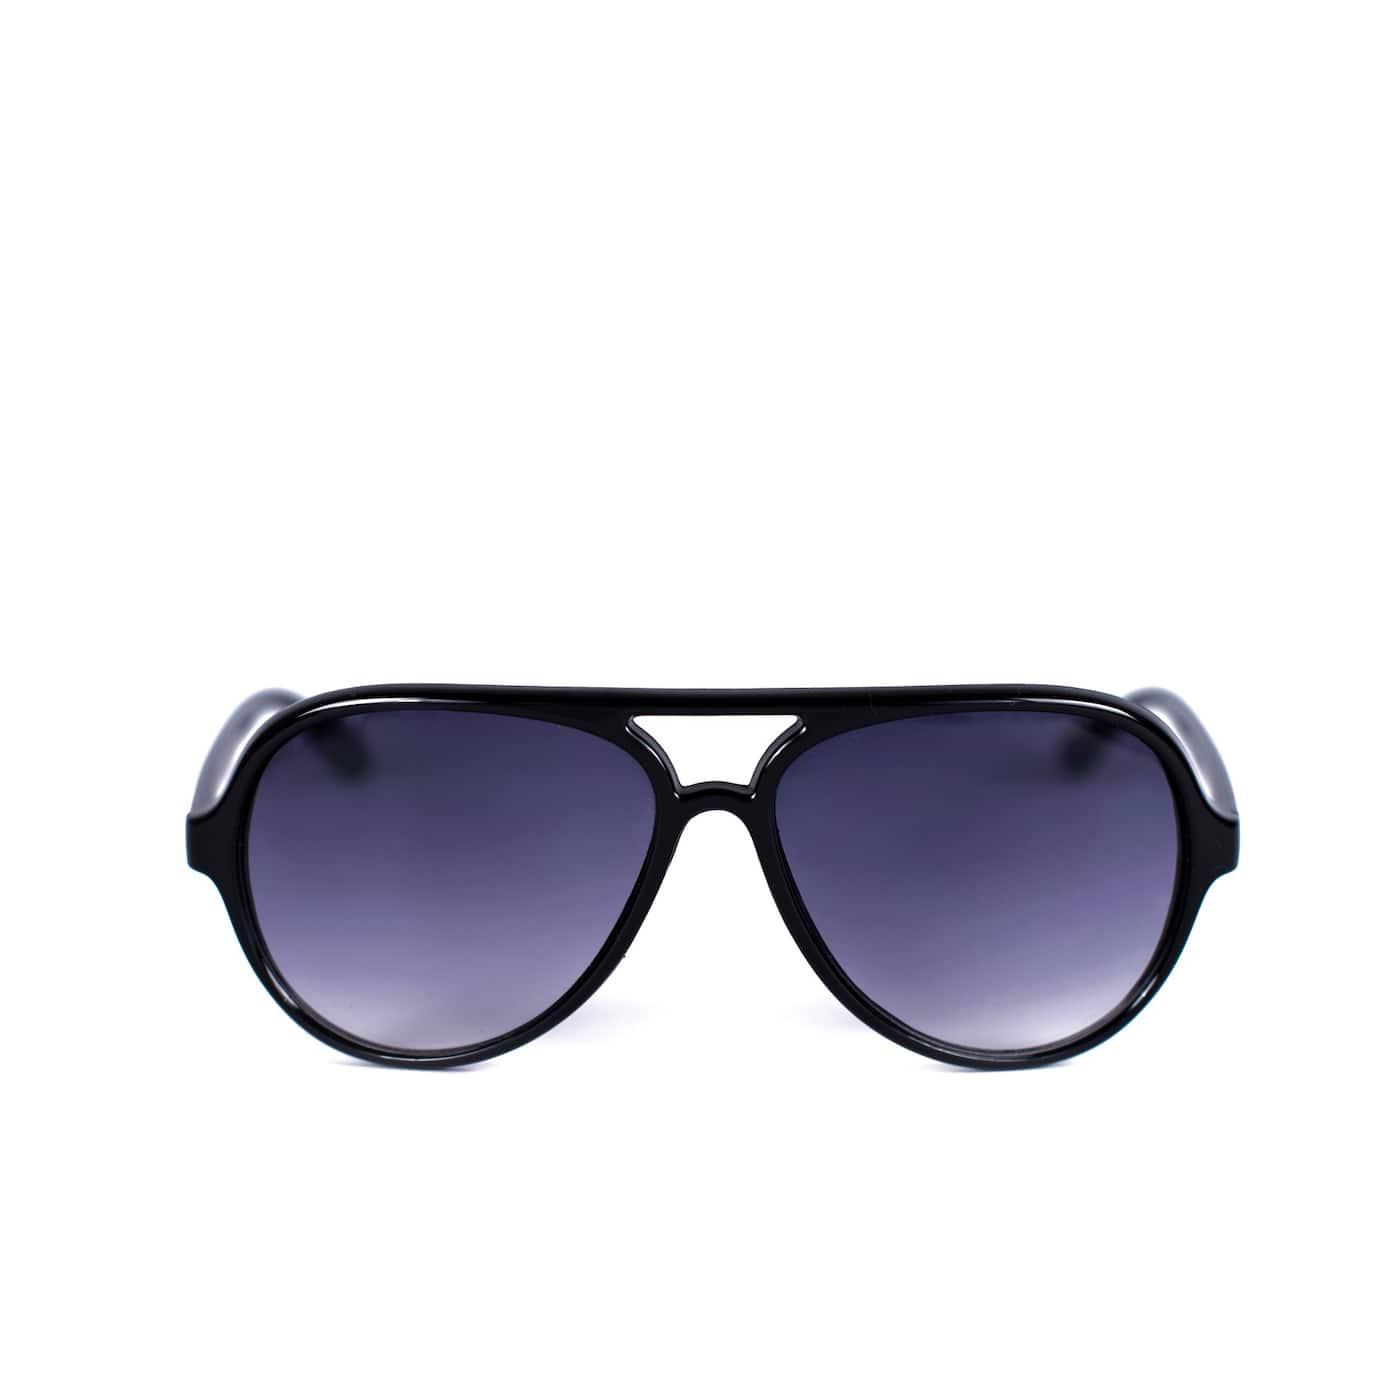 Art Of Polo Woman's Sunglasses ok19196